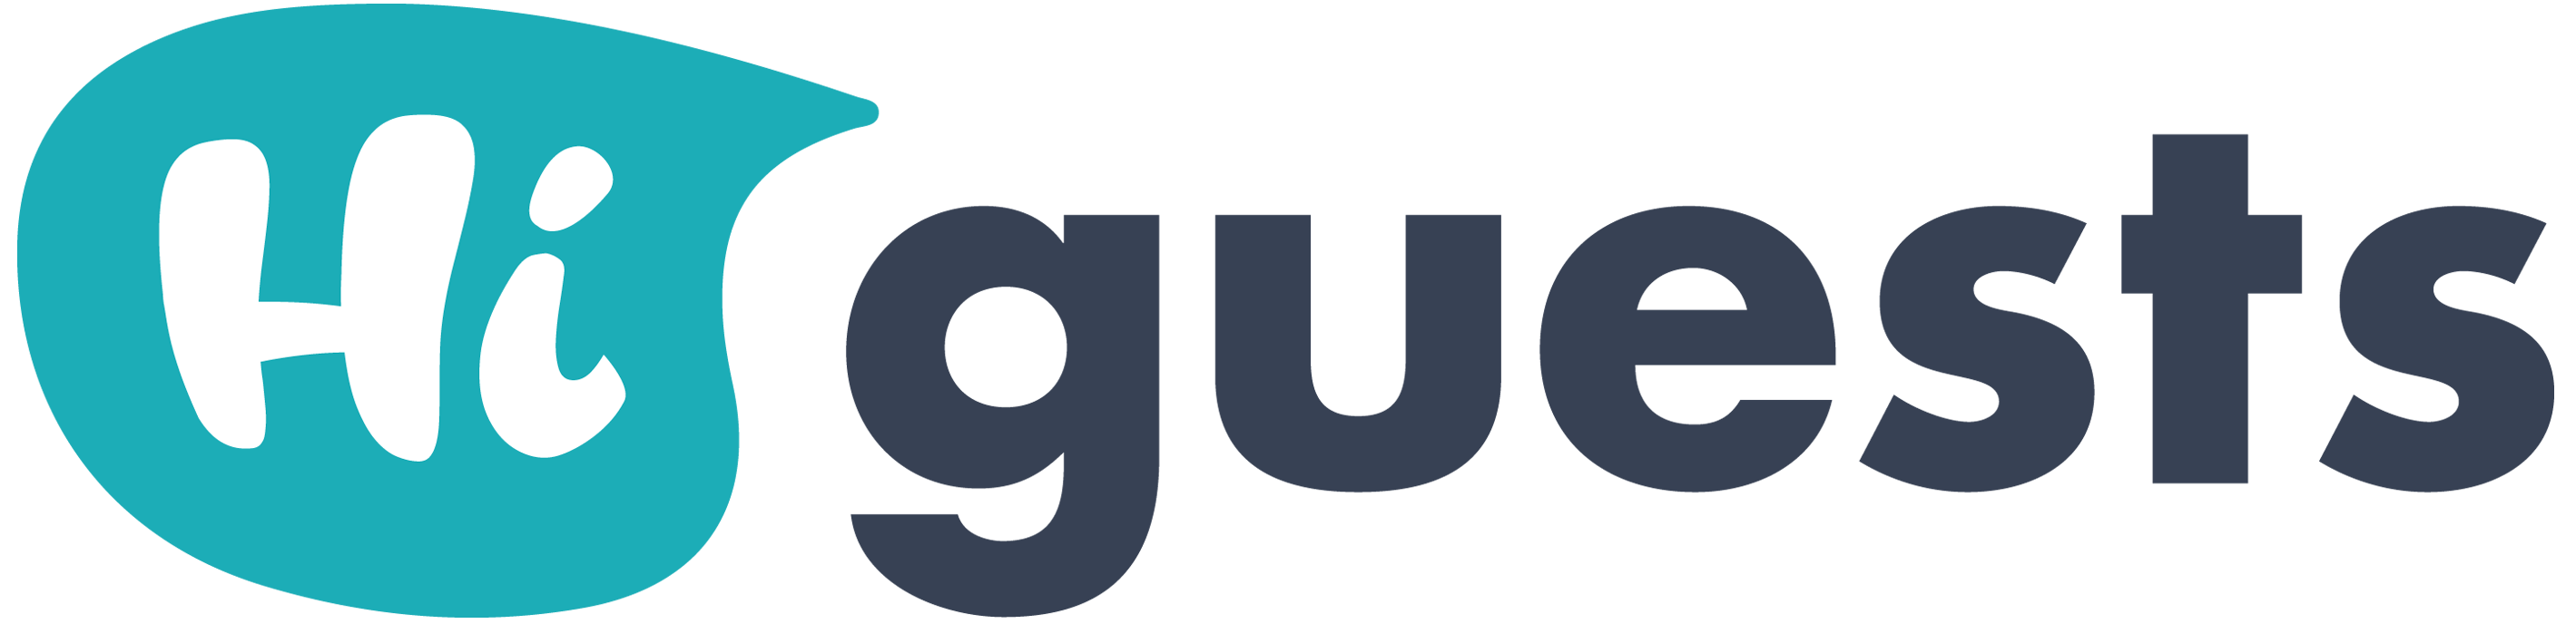 HiGuest